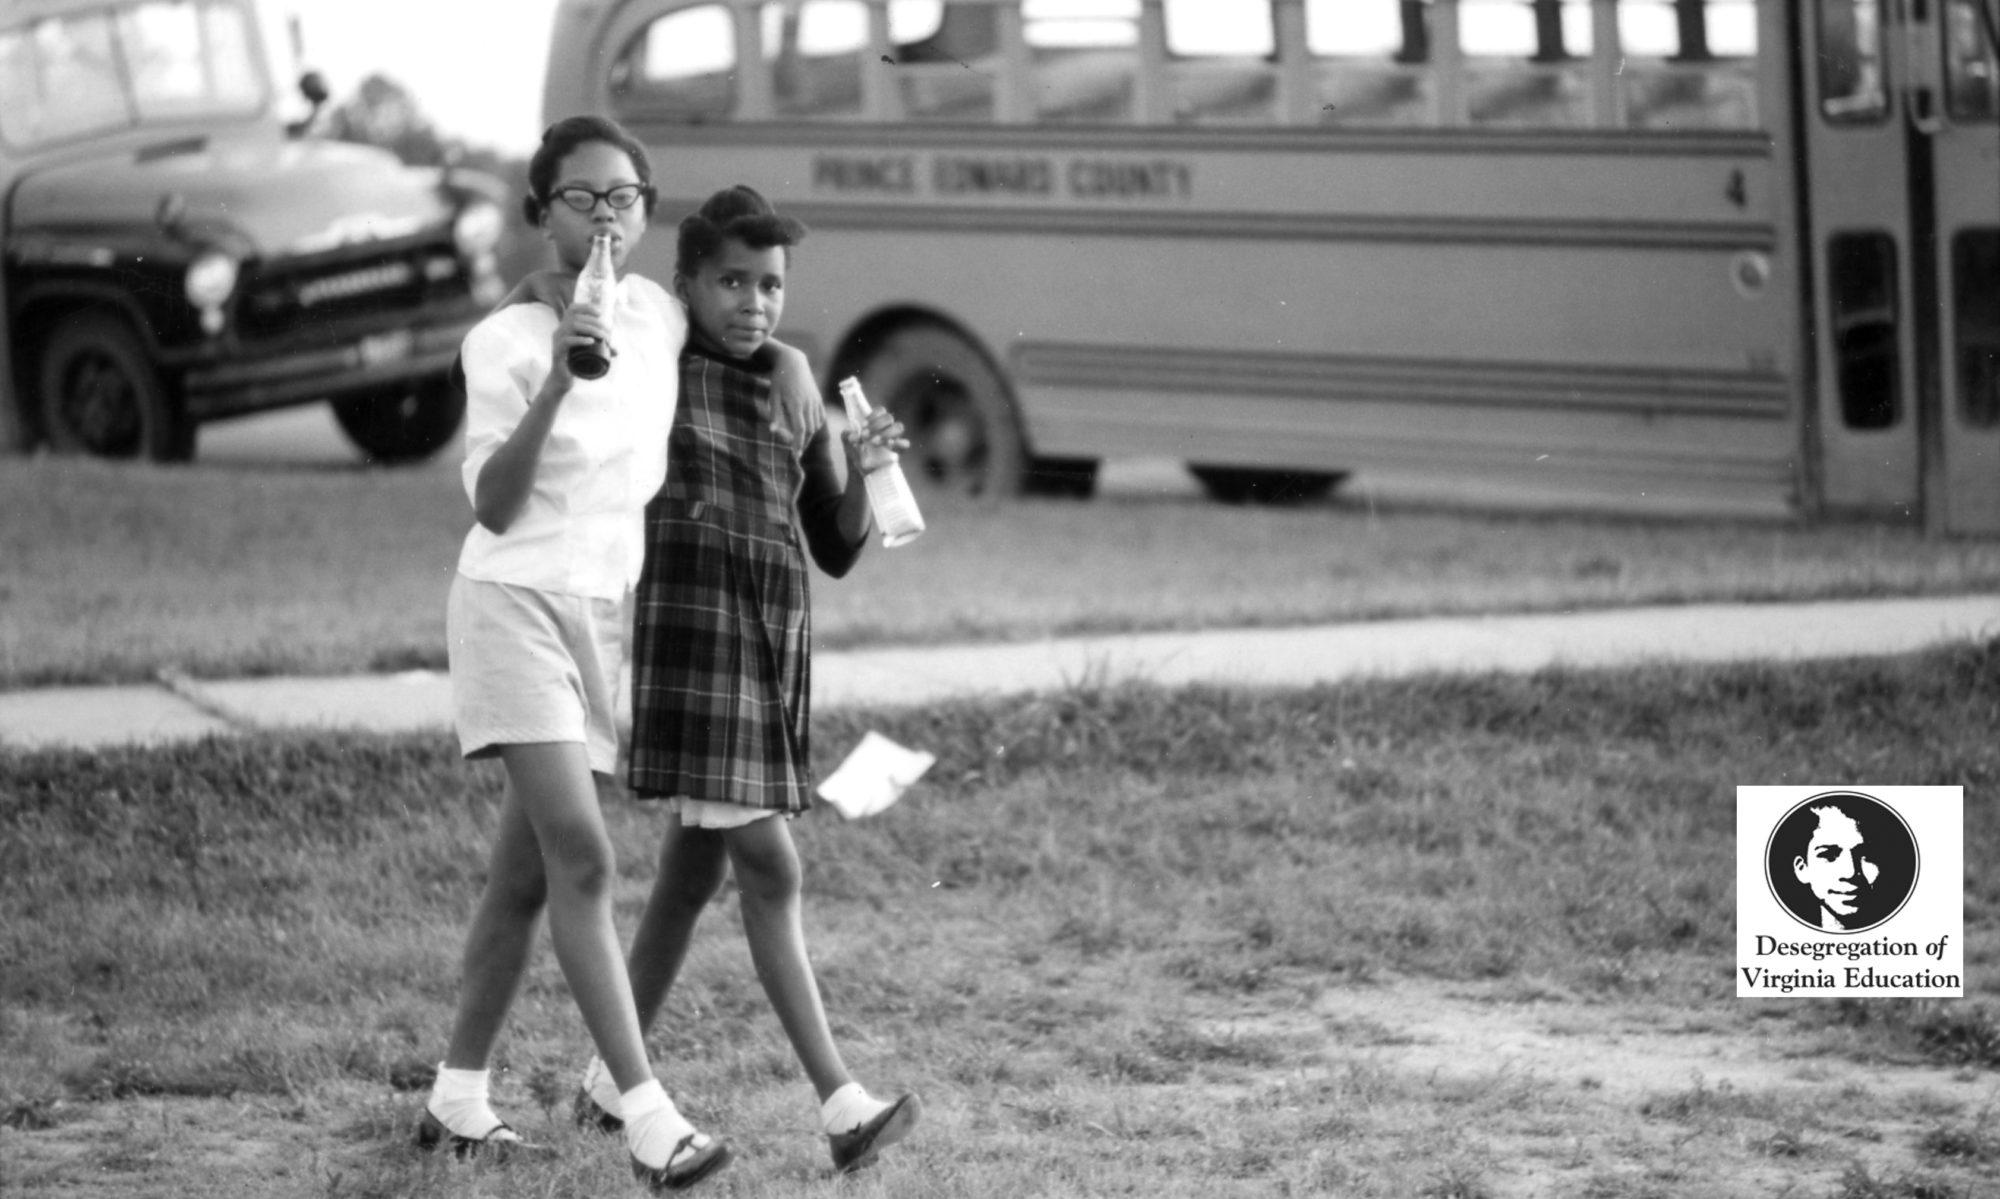 Desegregation of Virginia Education (DOVE)